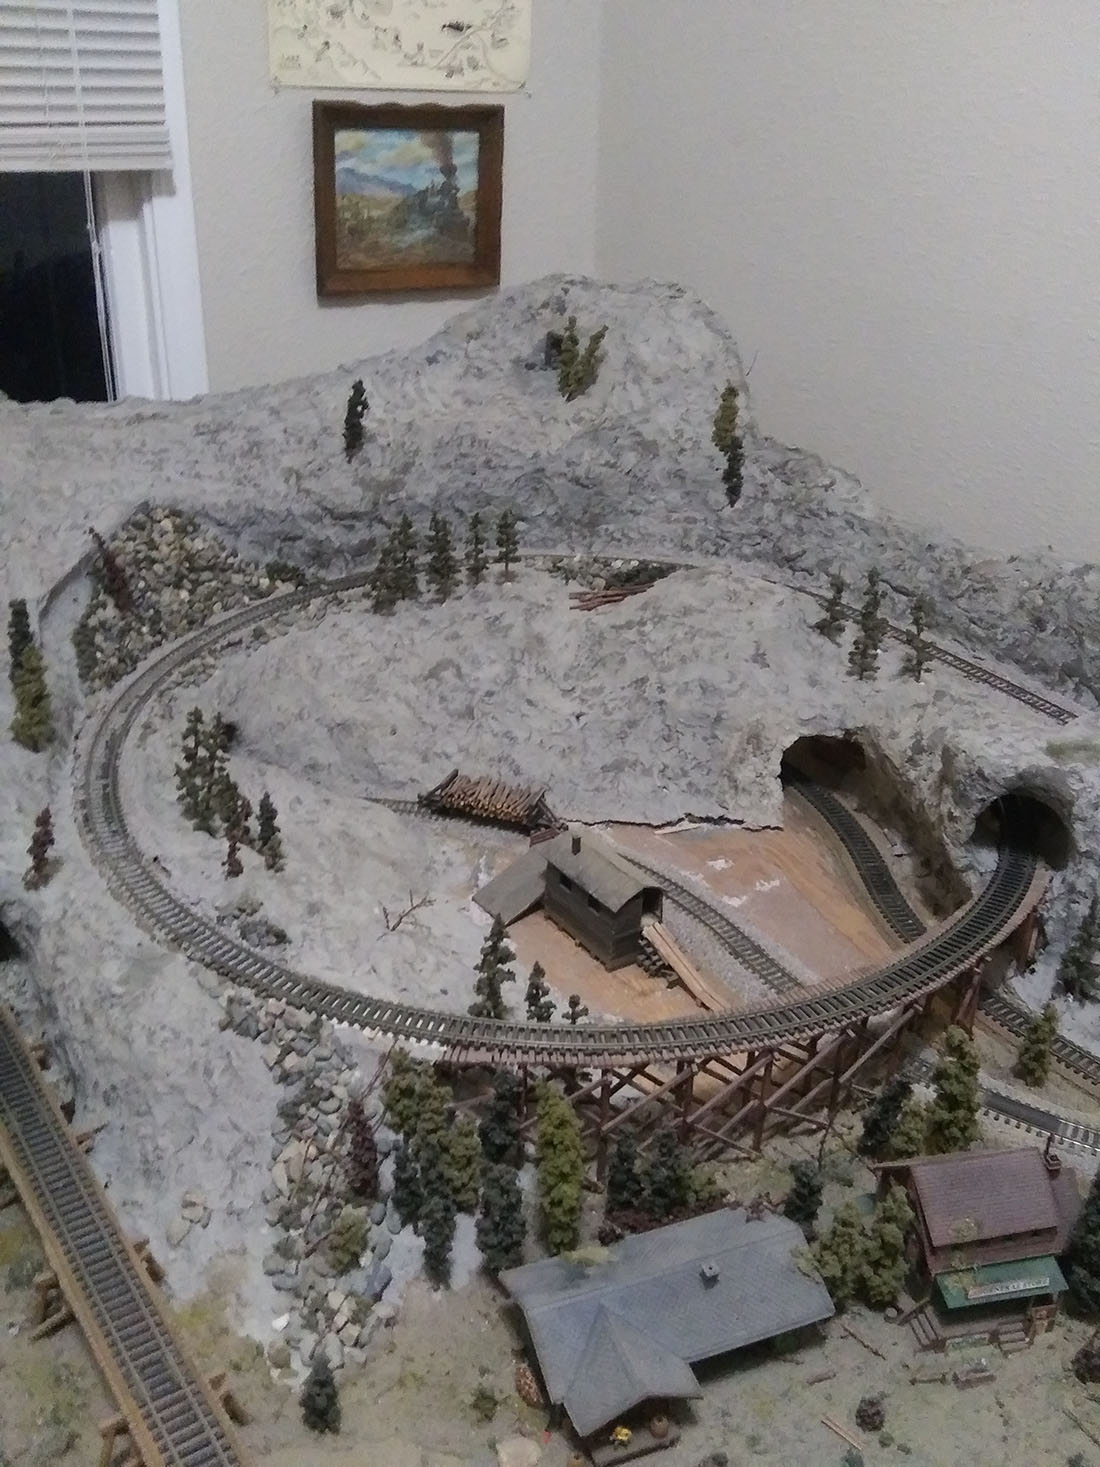 4x8 logging model railroad